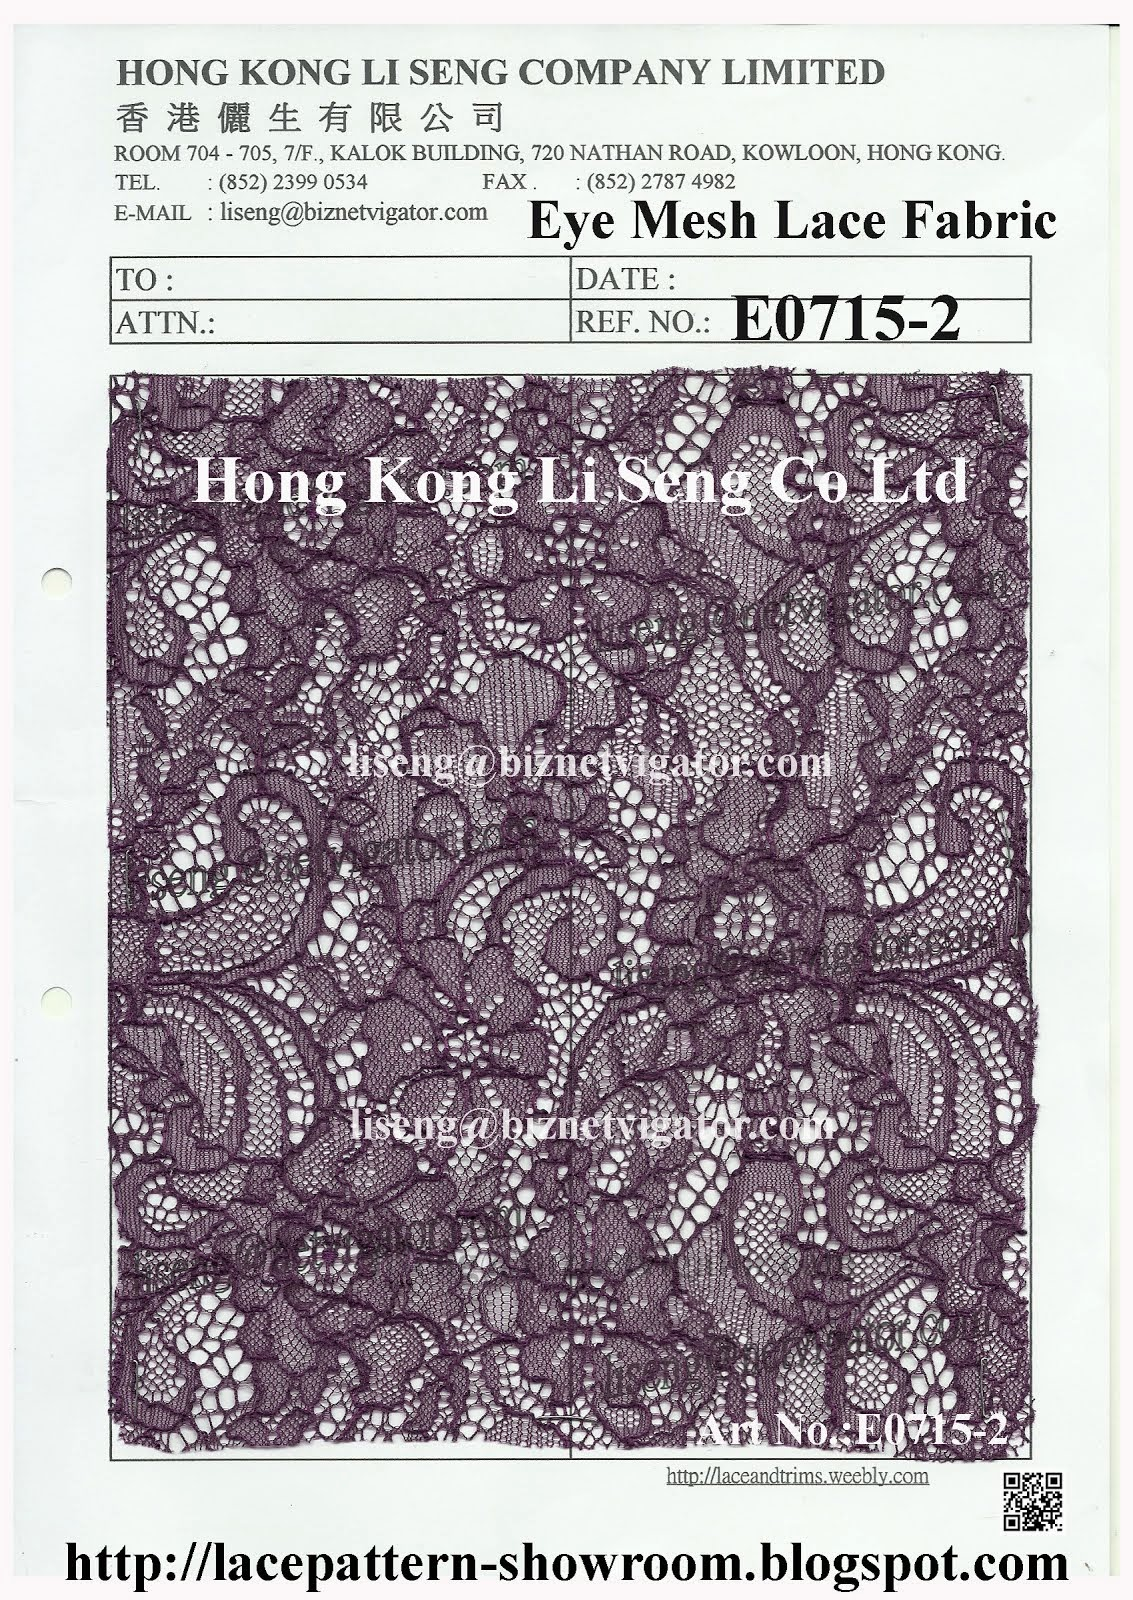 Introduce the Good Lace Trims, Lace Fabric Factory Wholesaler Supplier - Hong Kong Li Seng Co Ltd